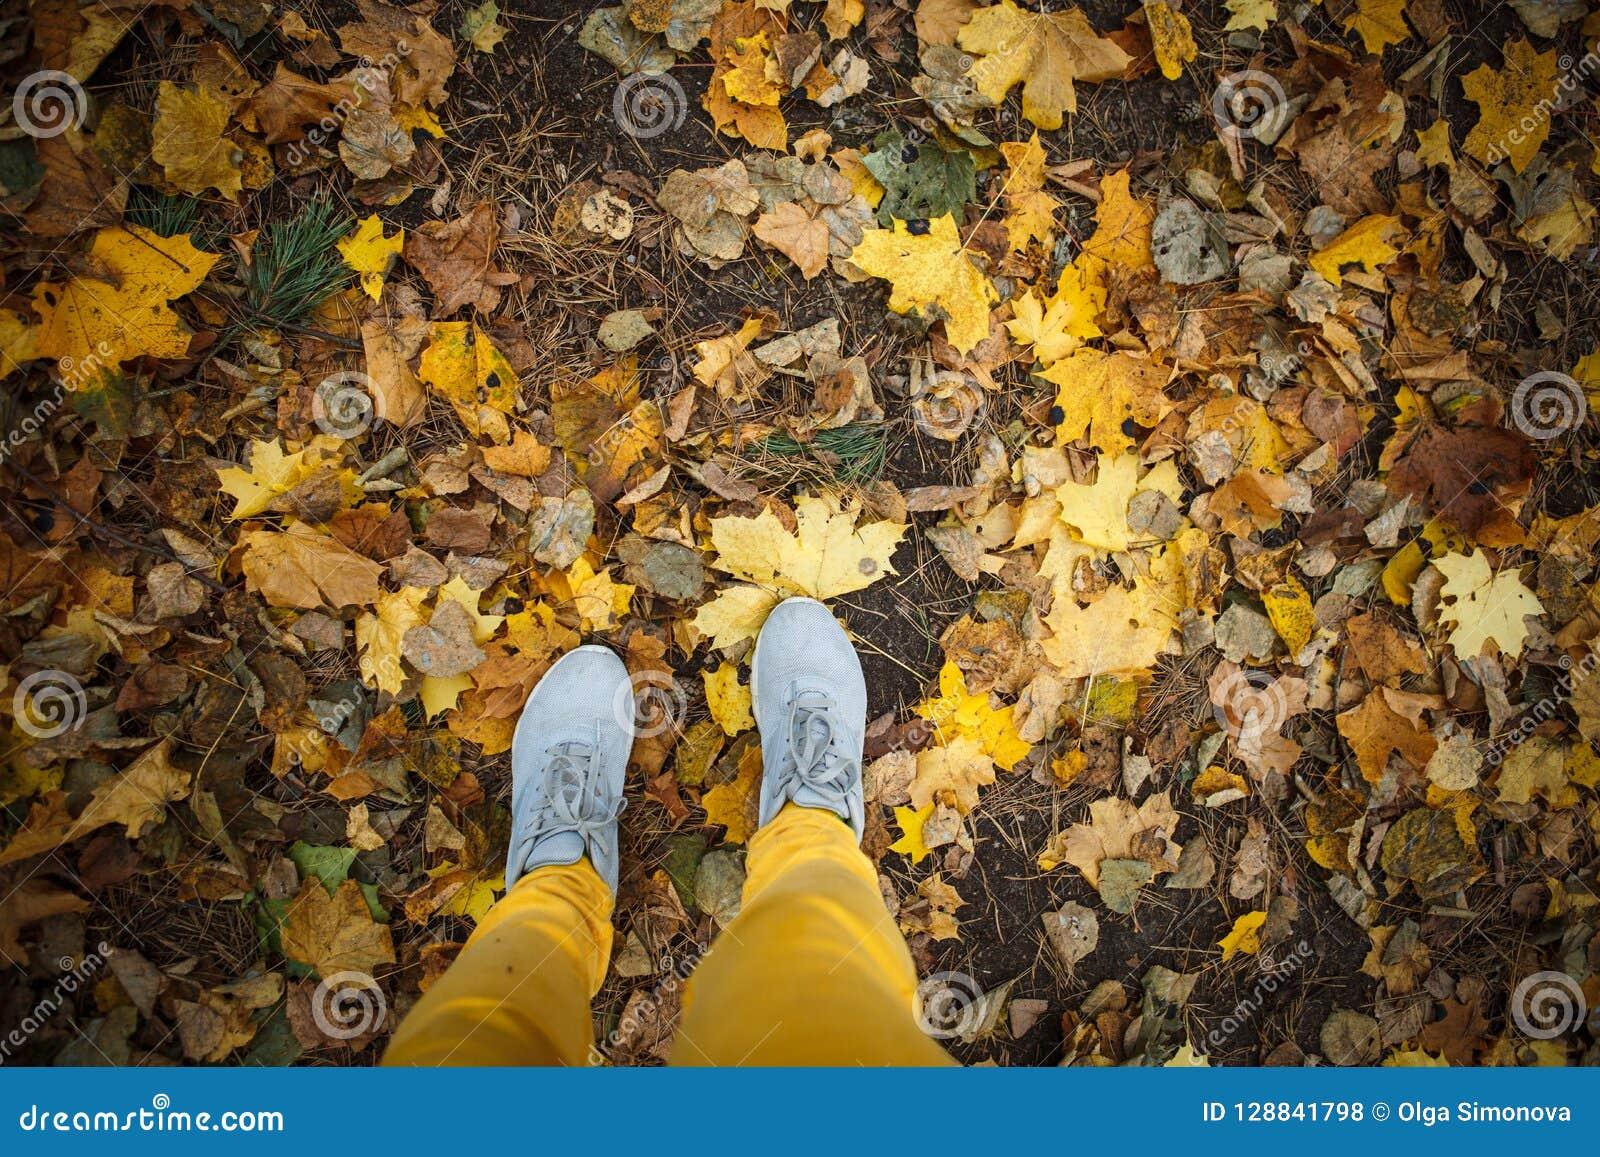 Golden autumn, yellow trees in sunlight, leaves underfoot.